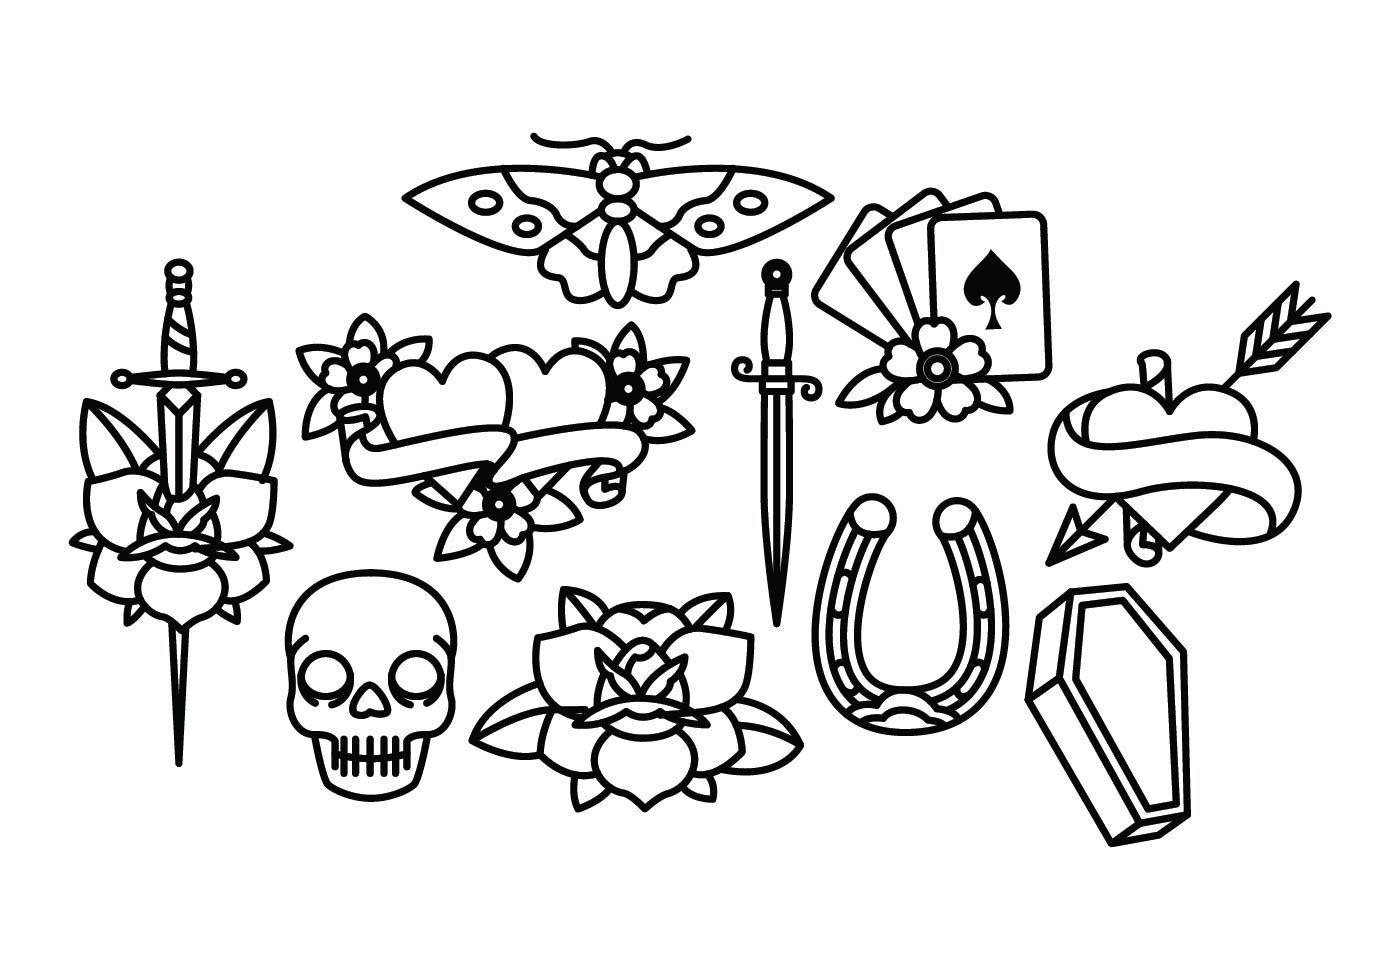 registar e descarregue pictures to pin on pinterest tattooskid. Black Bedroom Furniture Sets. Home Design Ideas